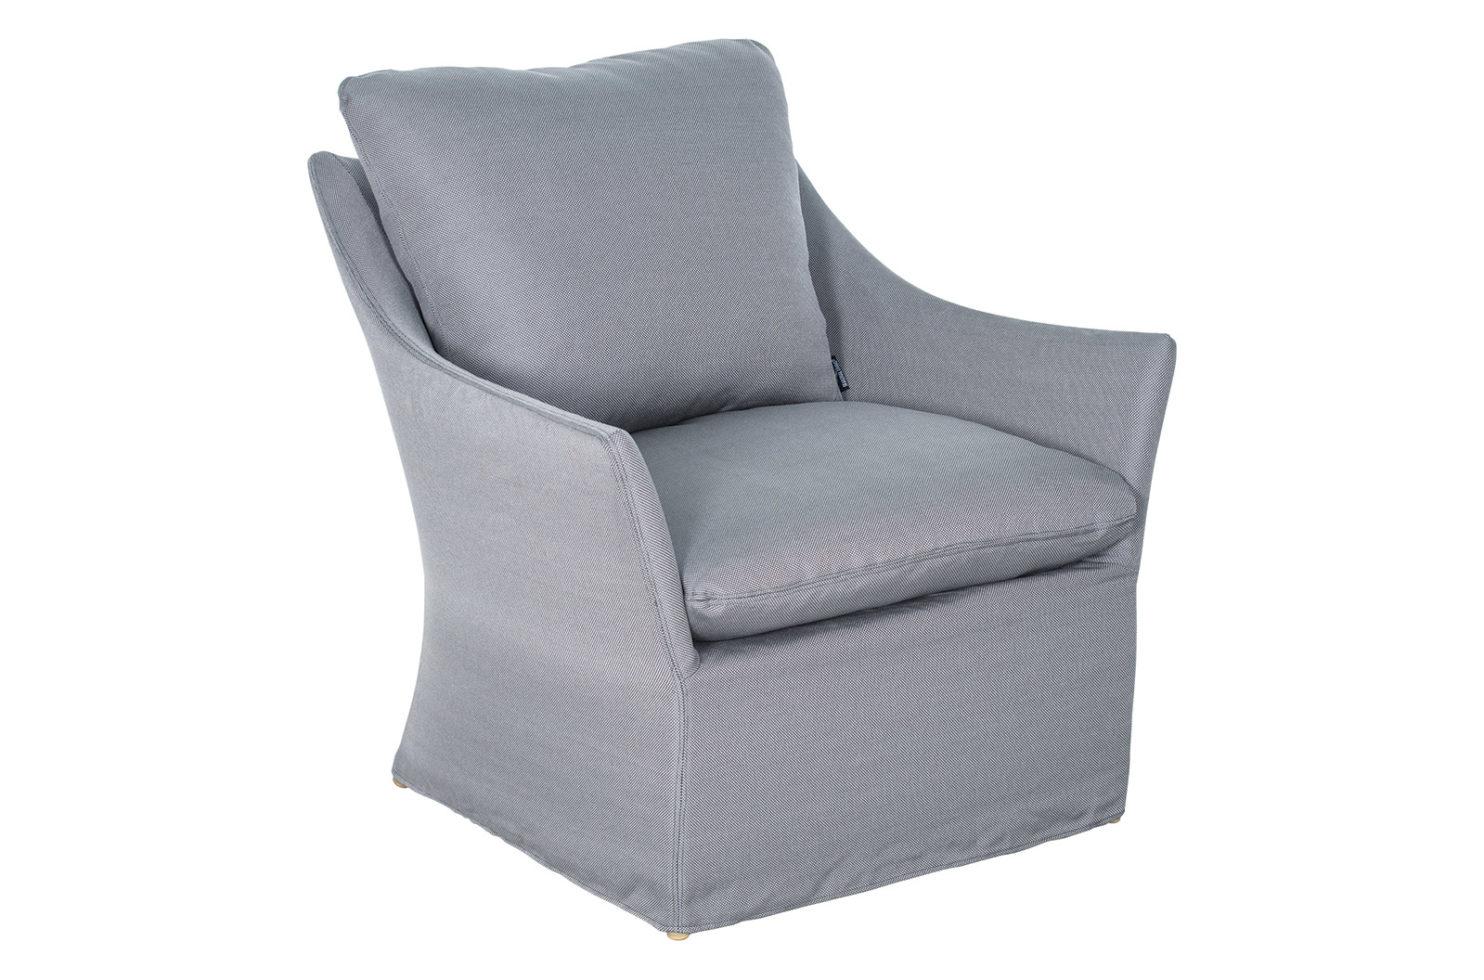 capri lounge 620FT091FC G 1 3Q